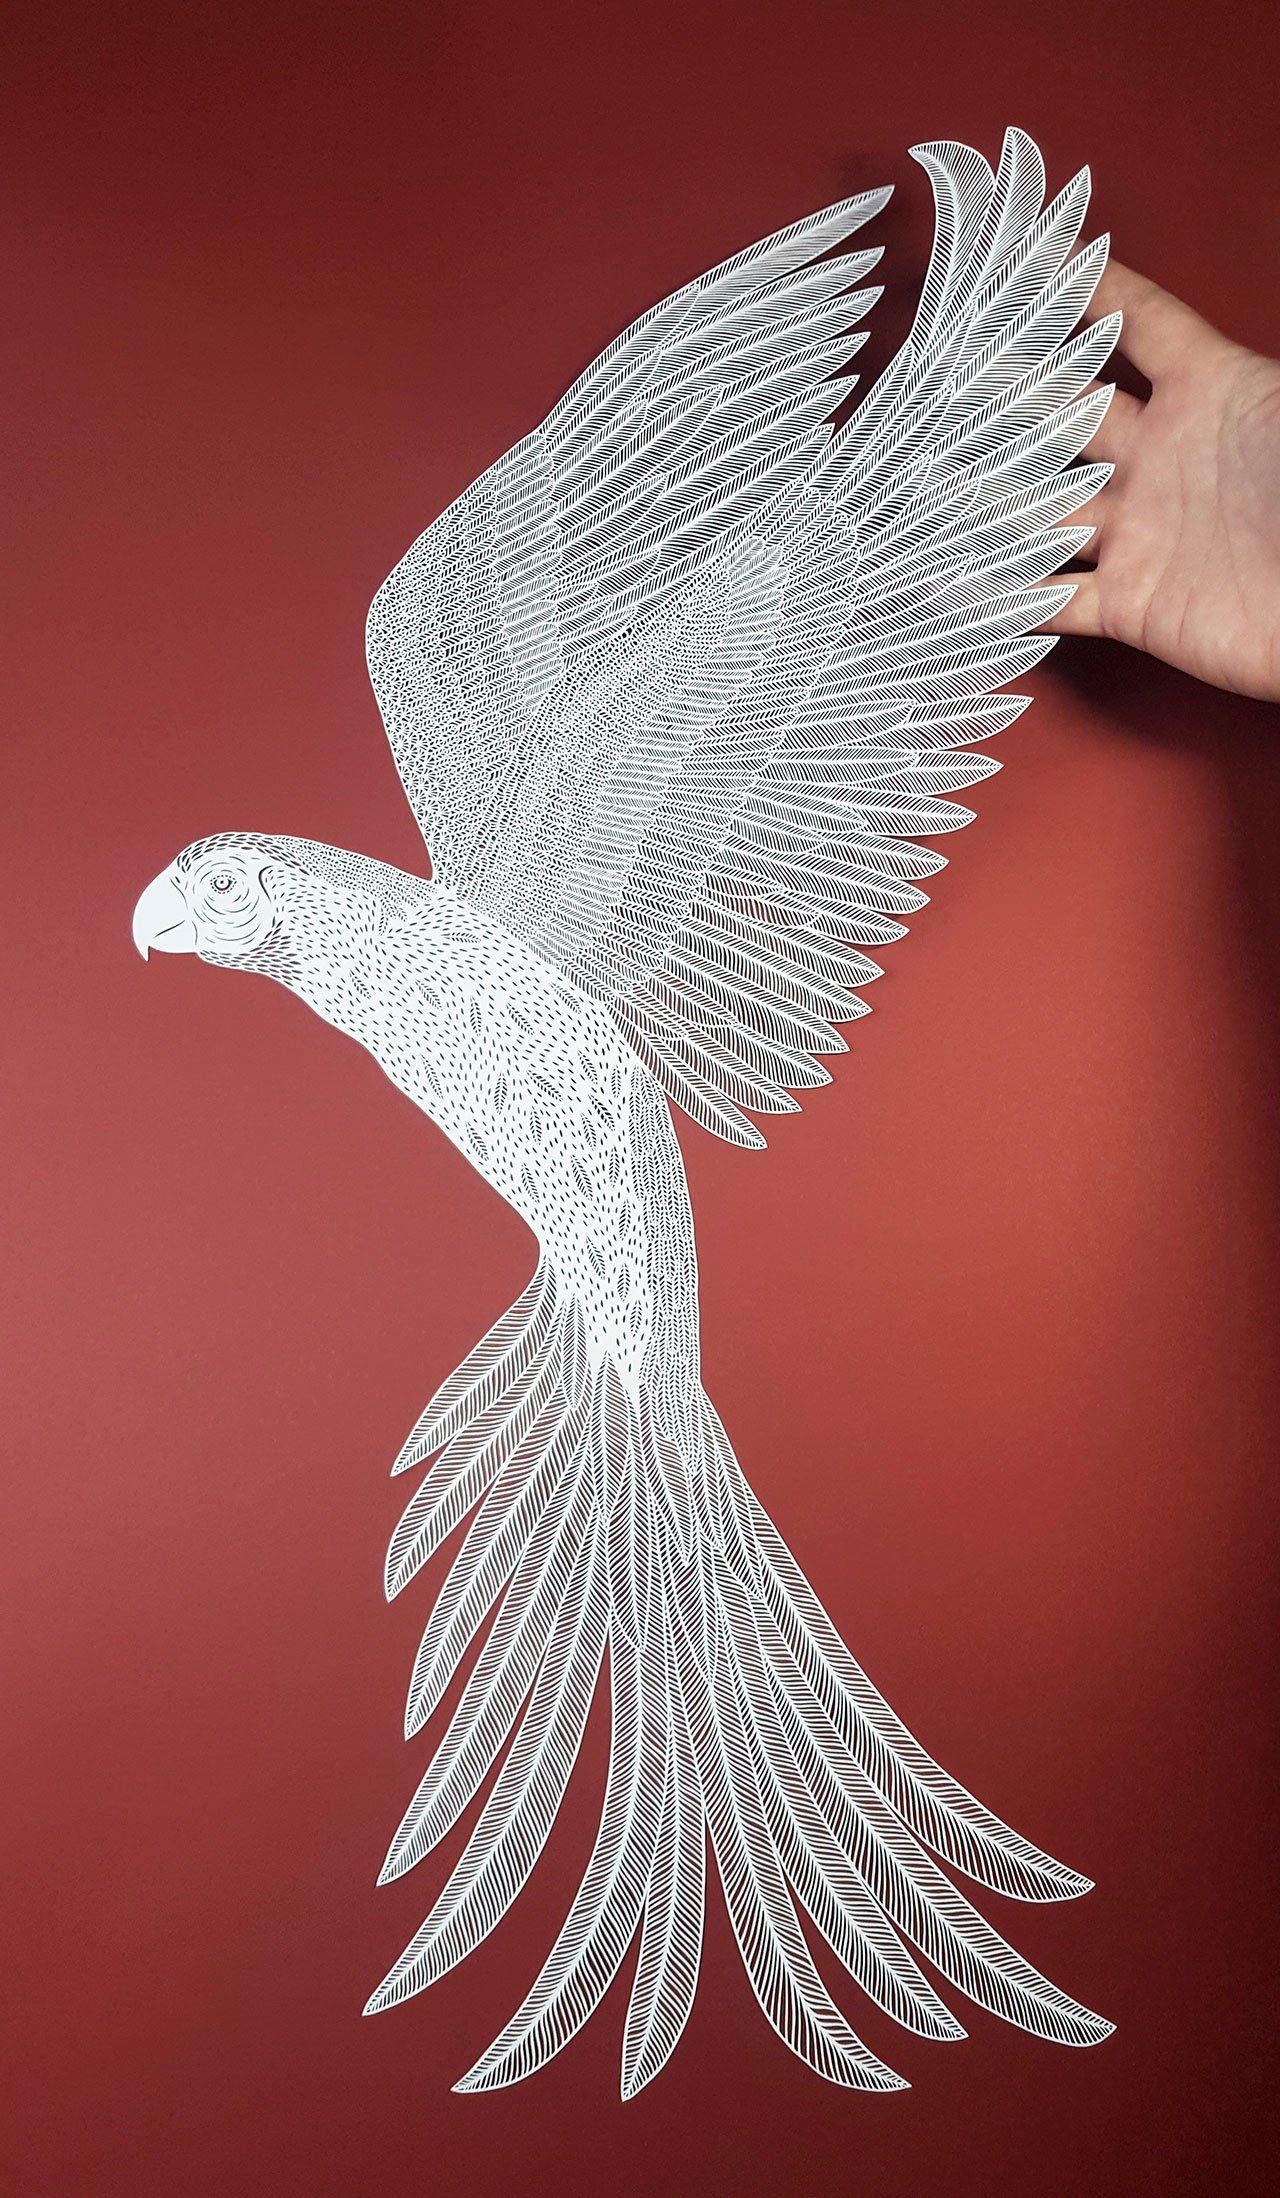 The Crisp Patterns of Pippa Dyrlaga s Paper Art